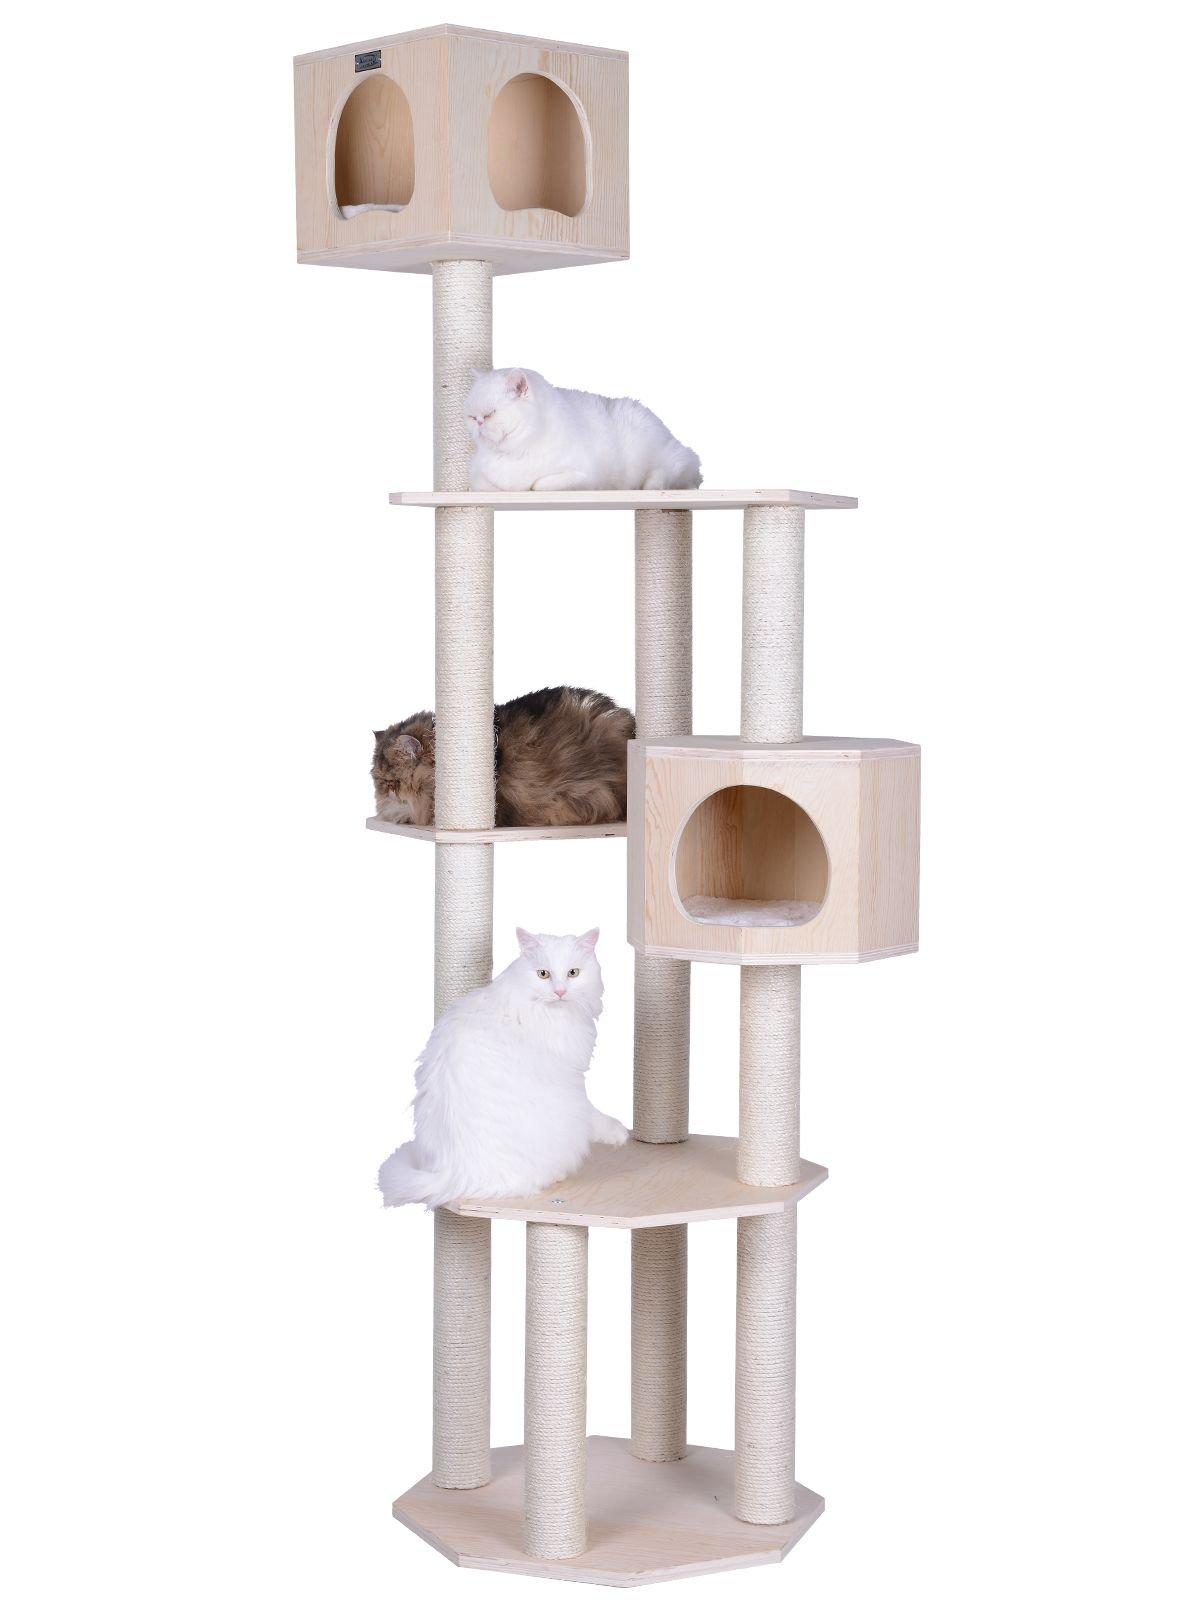 Armarkat Premium Pinus Sylvestris Wood Cat Tree Condo Scratching Post Kitty Furniture Tall Sturdy Light Wood and Sisal Rope